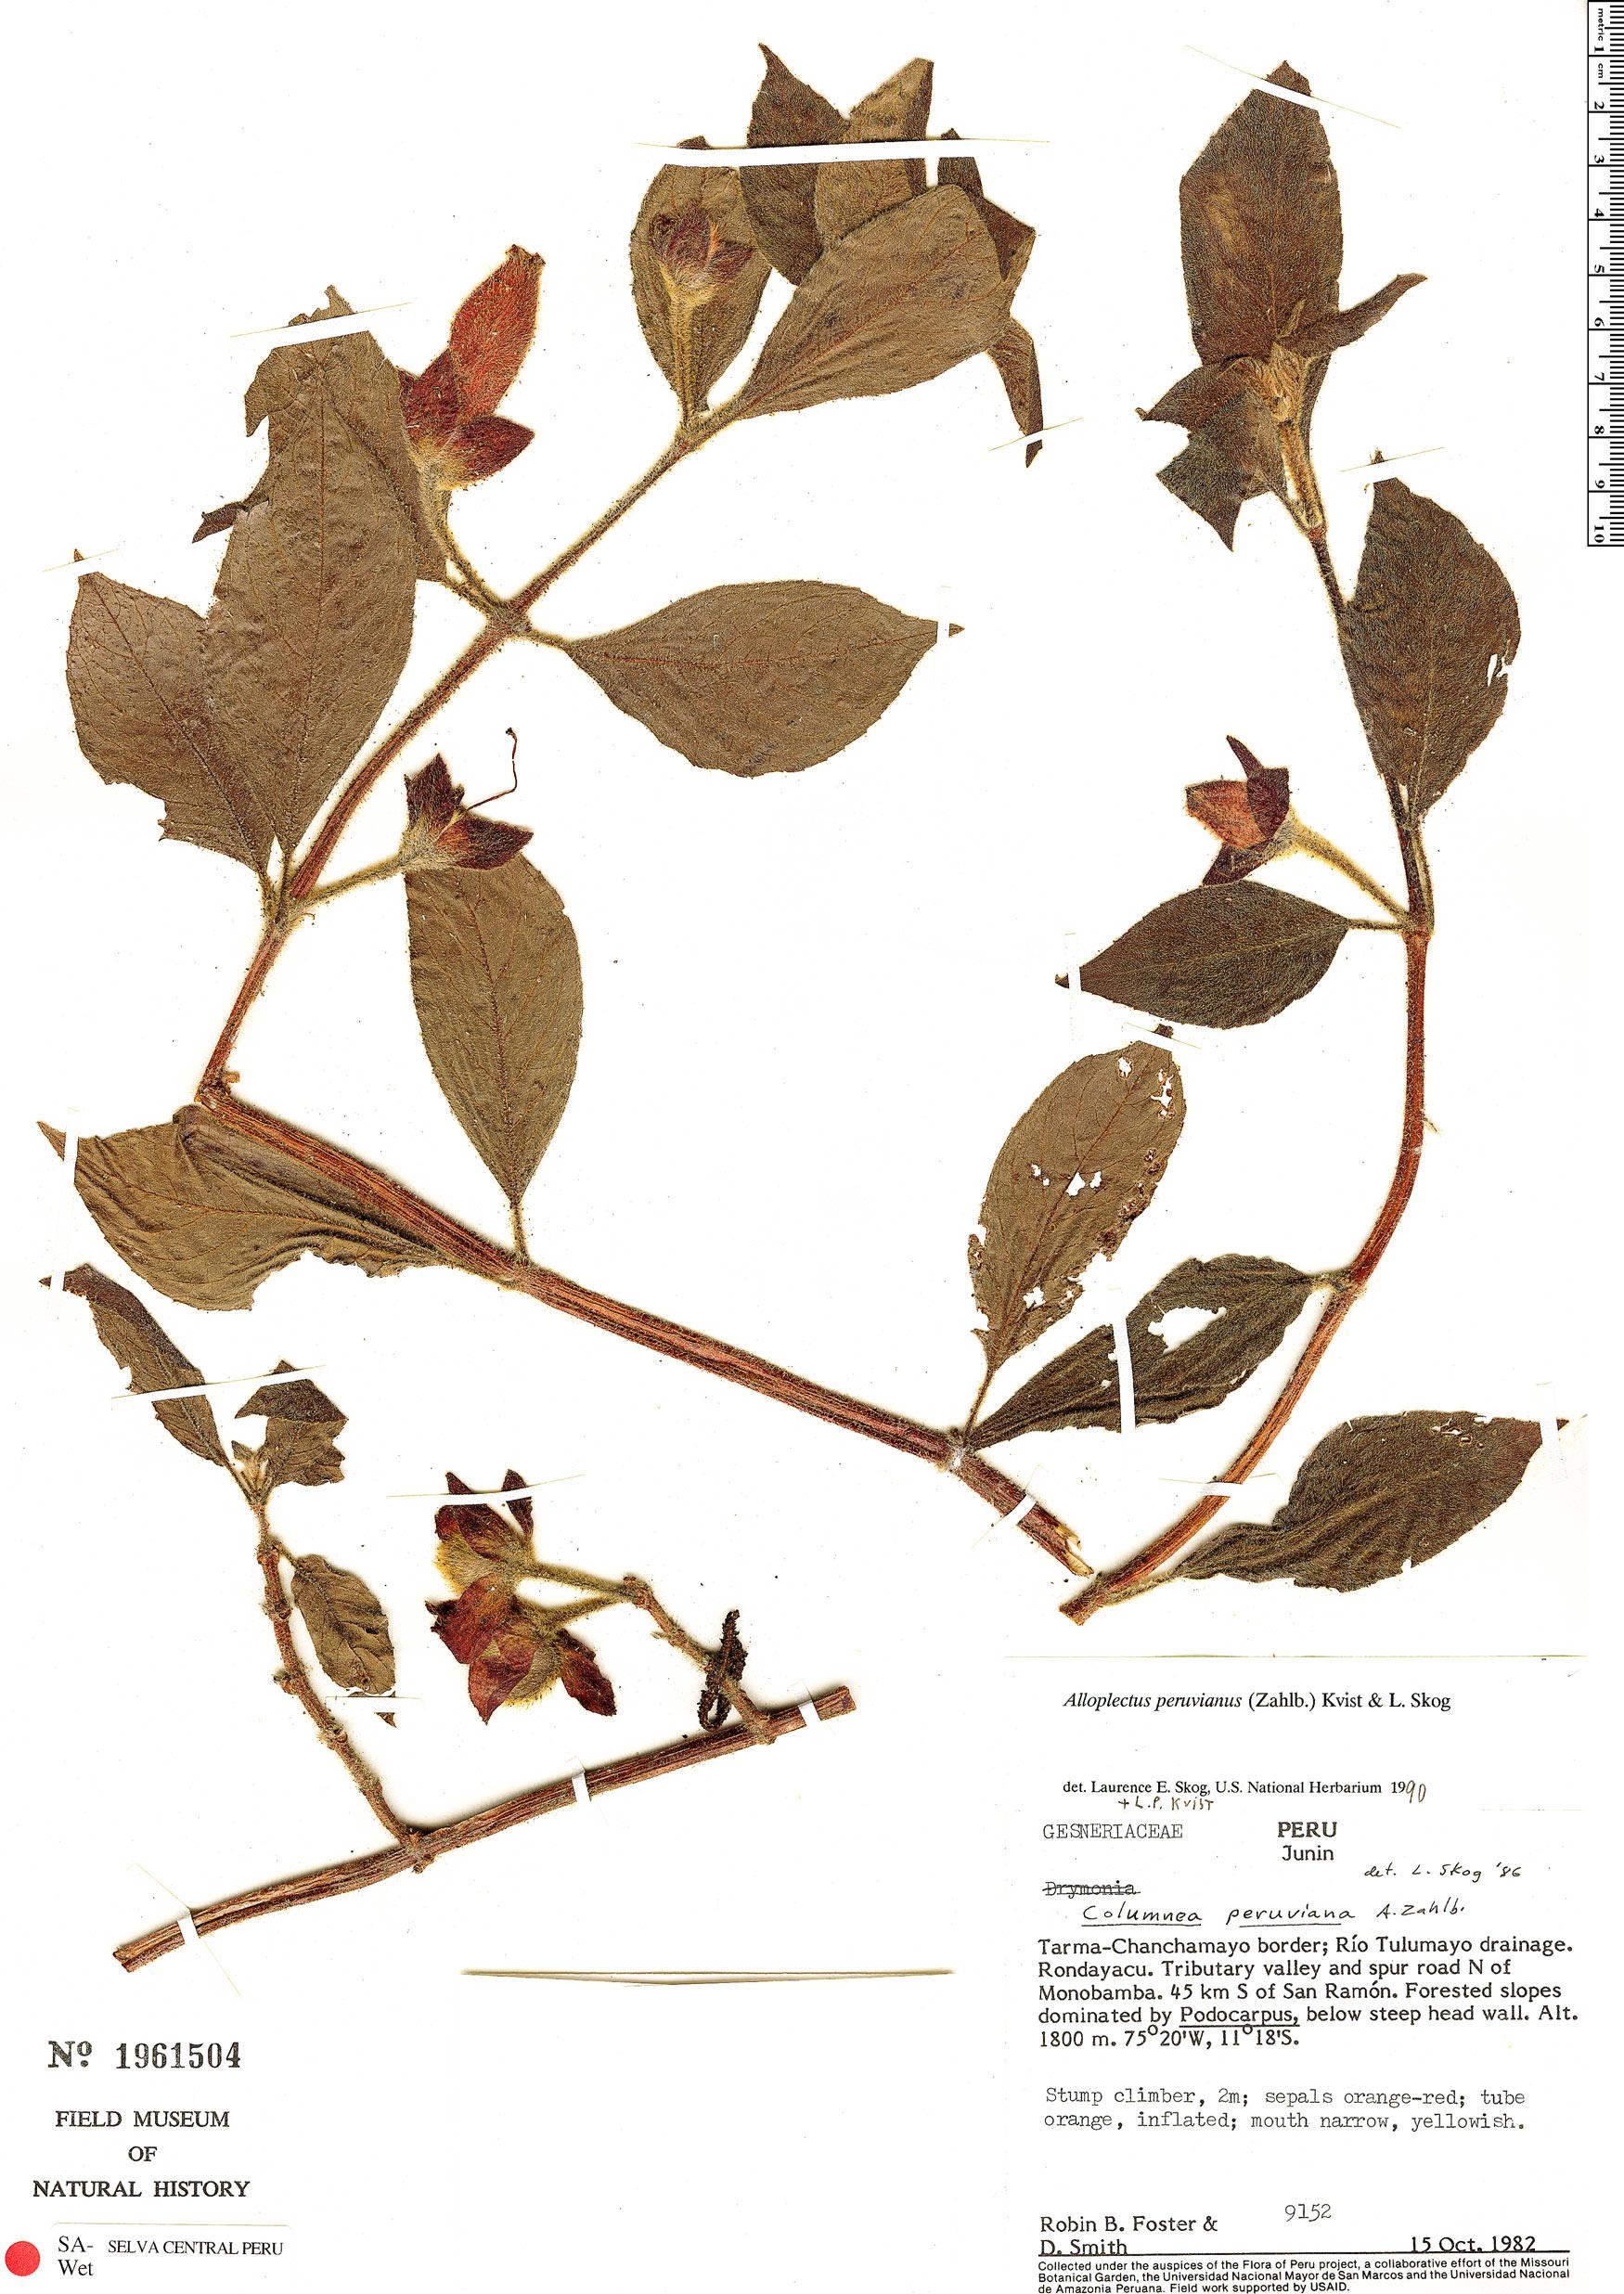 Specimen: Columnea peruviana